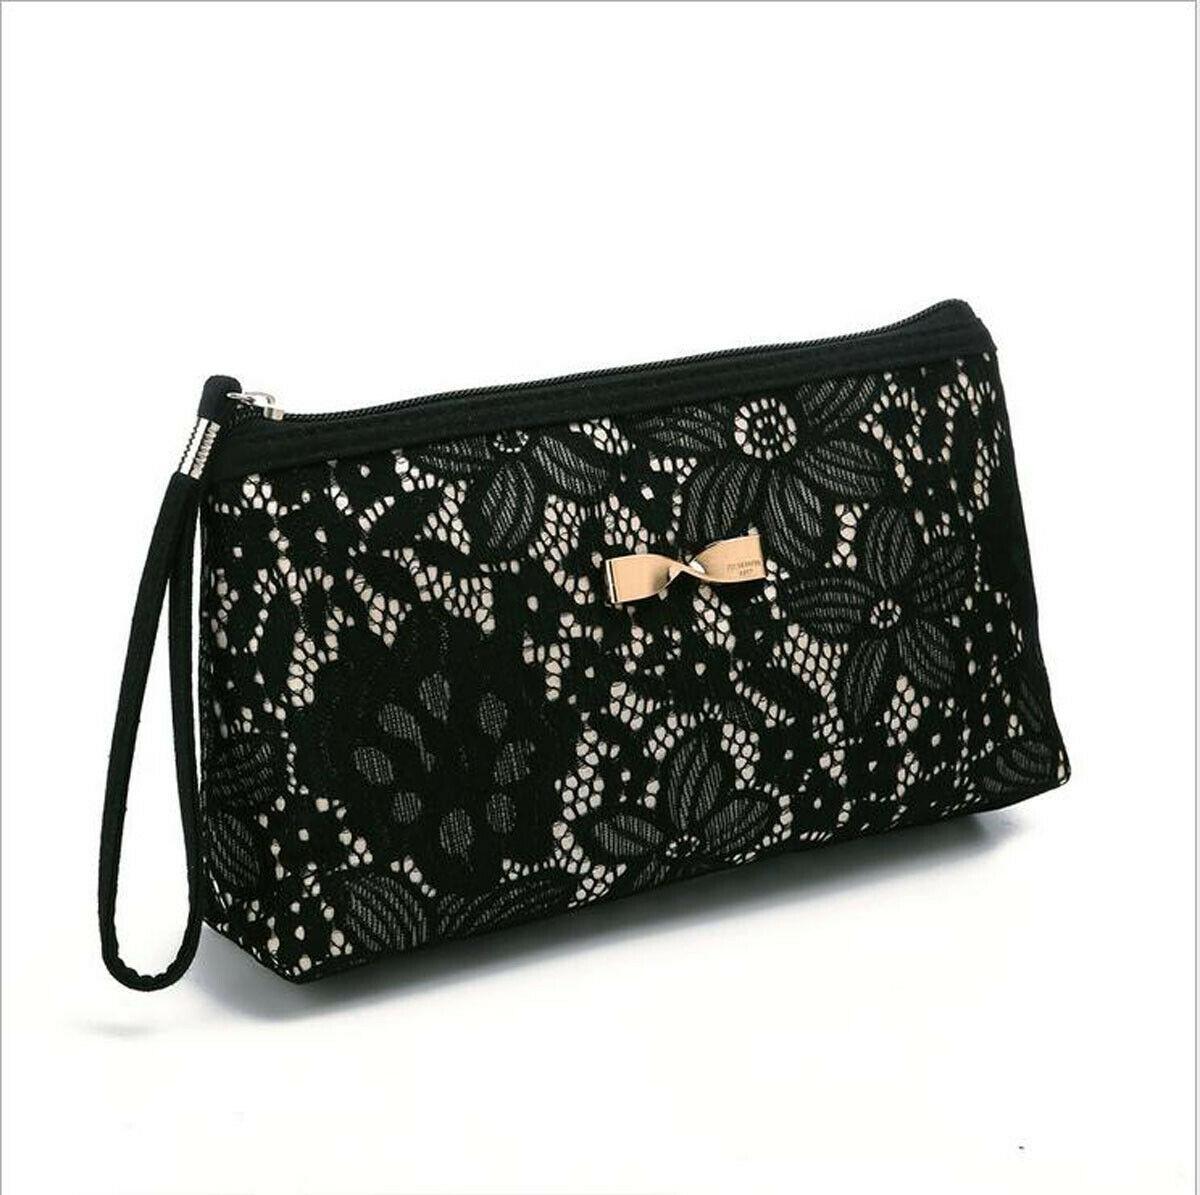 Fashion Women's Cosmetic Bag Solid Color Travel Ladies Wash Bag Lace Lace Makeup Bag Mini Clutch Bag